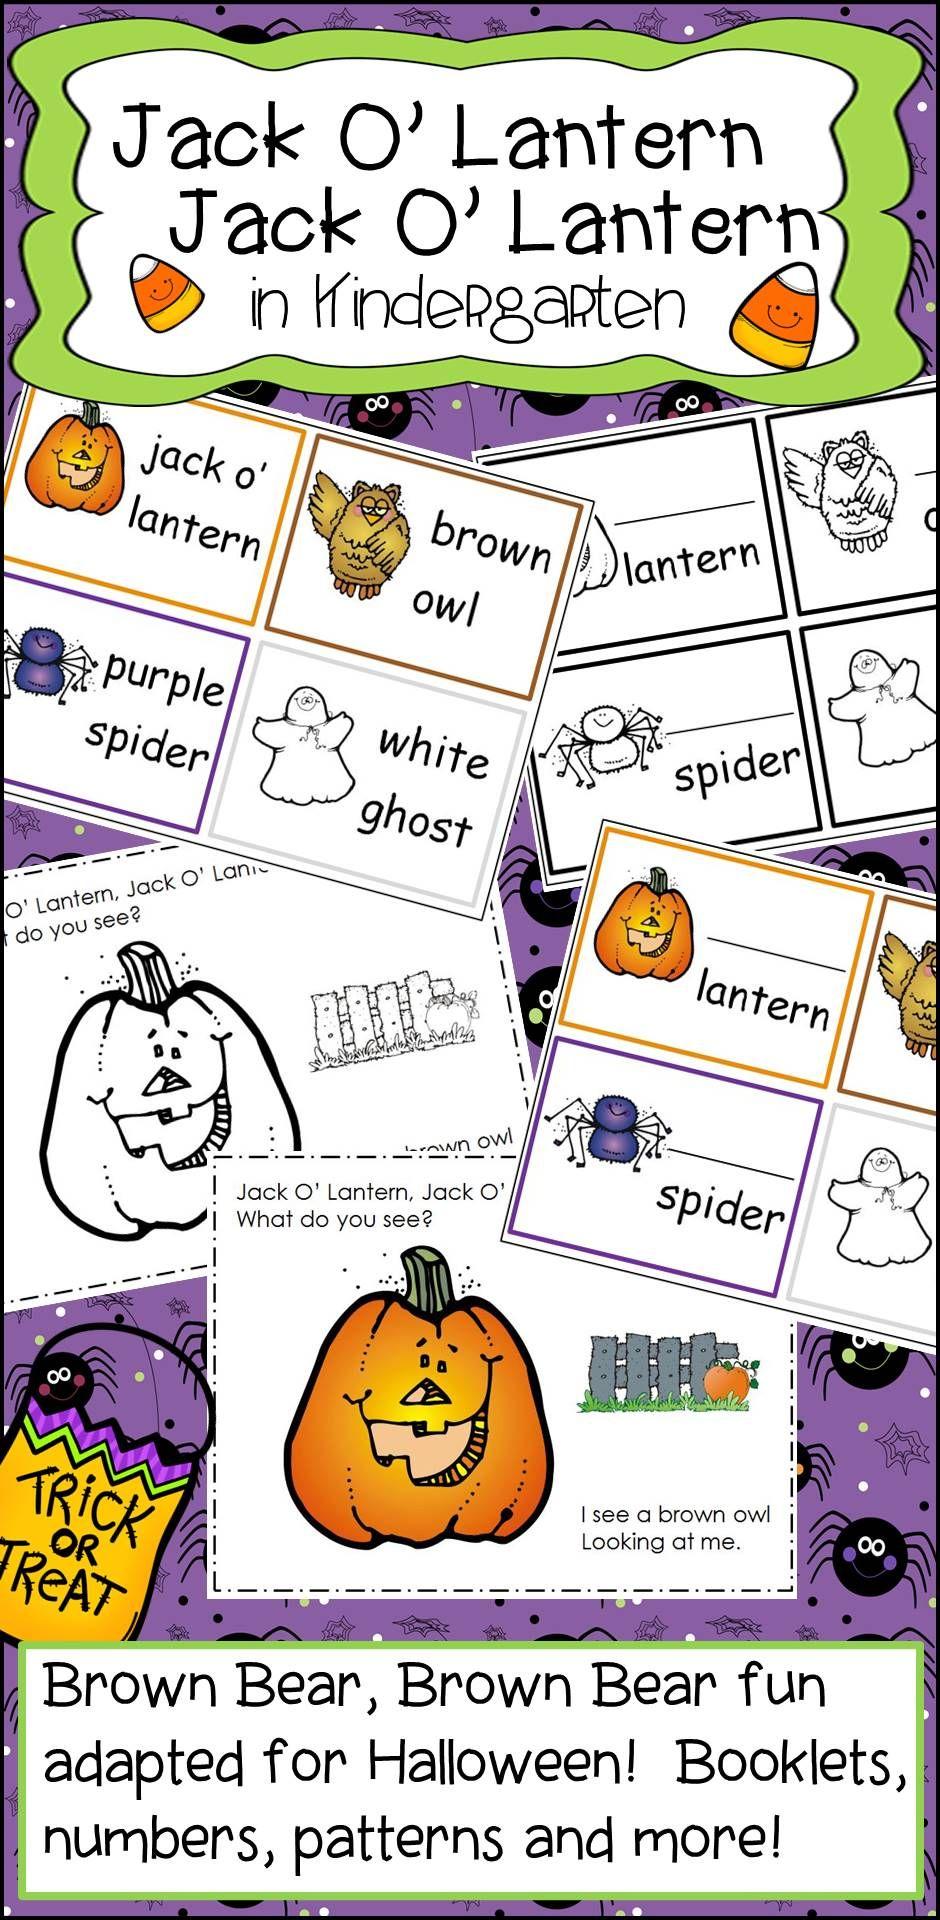 Jack O Lantern Jack O Lantern Activities in Kindergarten | Halloween ...